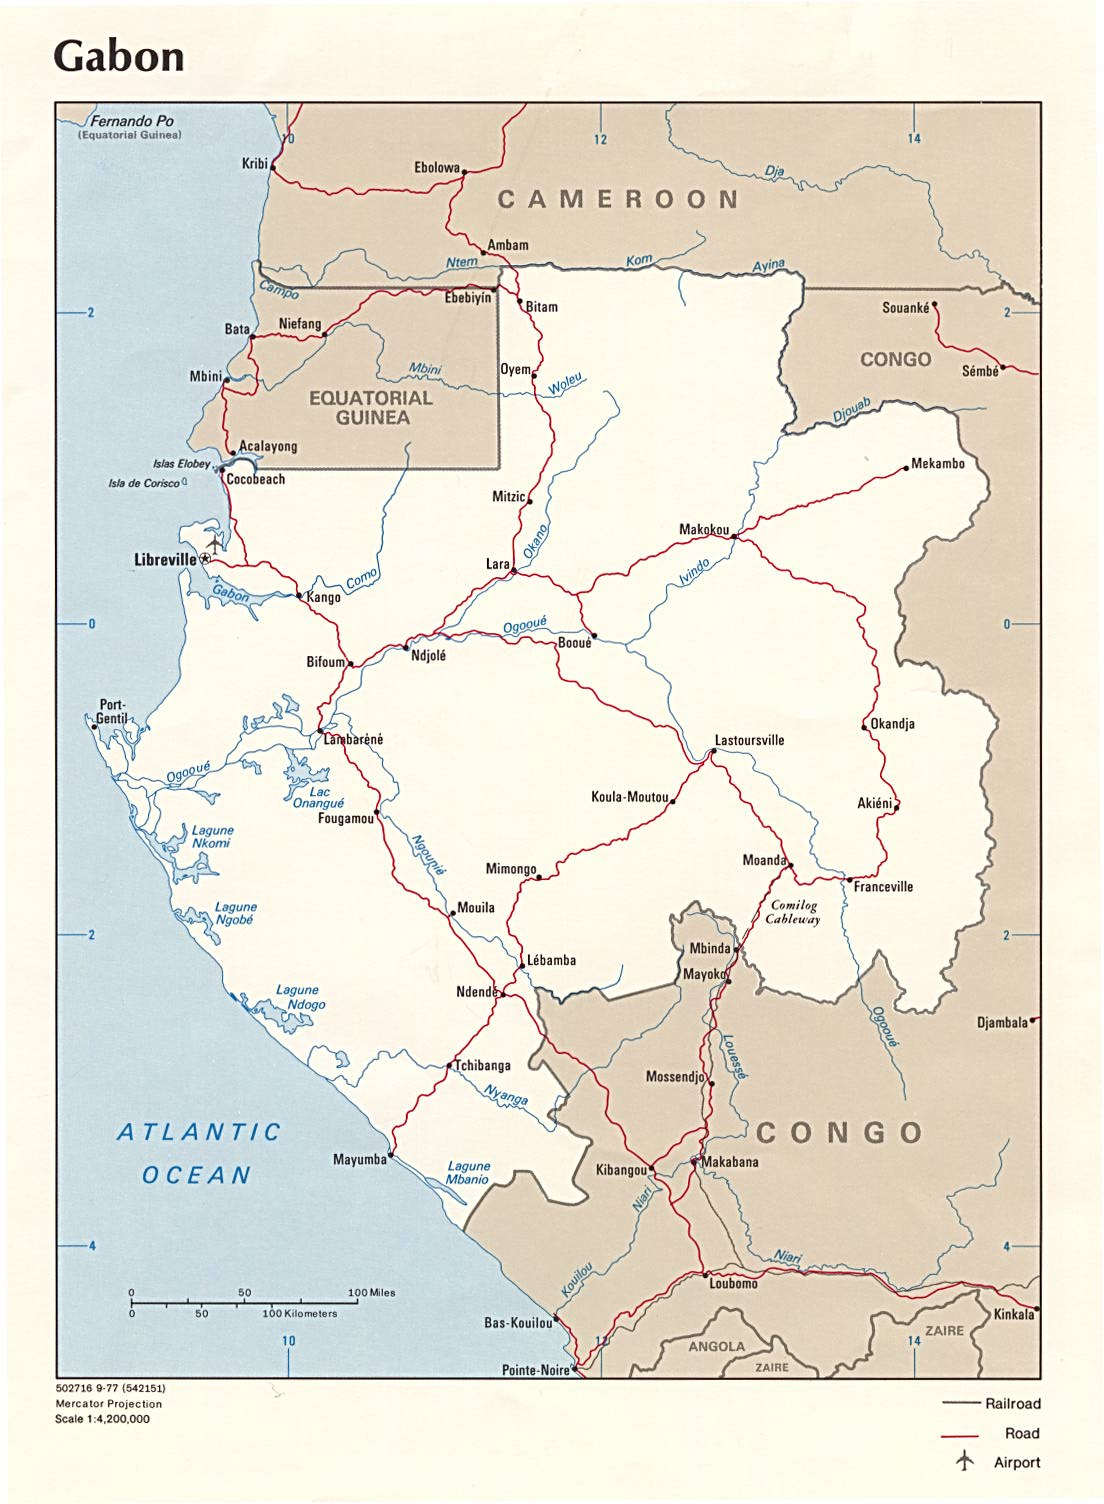 Gabon Maps - Perry-Castañeda Map Collection - UT Liry Online on namibia map, spain map, egypt map, haiti map, zaire map, mali map, swaziland map, cape verde map, tunisia map, congo map, botswana map, niger map, mozambique map, algeria map, angola map, french map, africa map, morocco map, bangladesh map, libreville map, sudan map, kenya map, ethiopia map, libya map, grenada map, uganda map, madagascar map, senegal map, the gambia map, liberia map, rwanda map, republique centrafricaine map, chad map, ghana map, malawi map, zambia map,